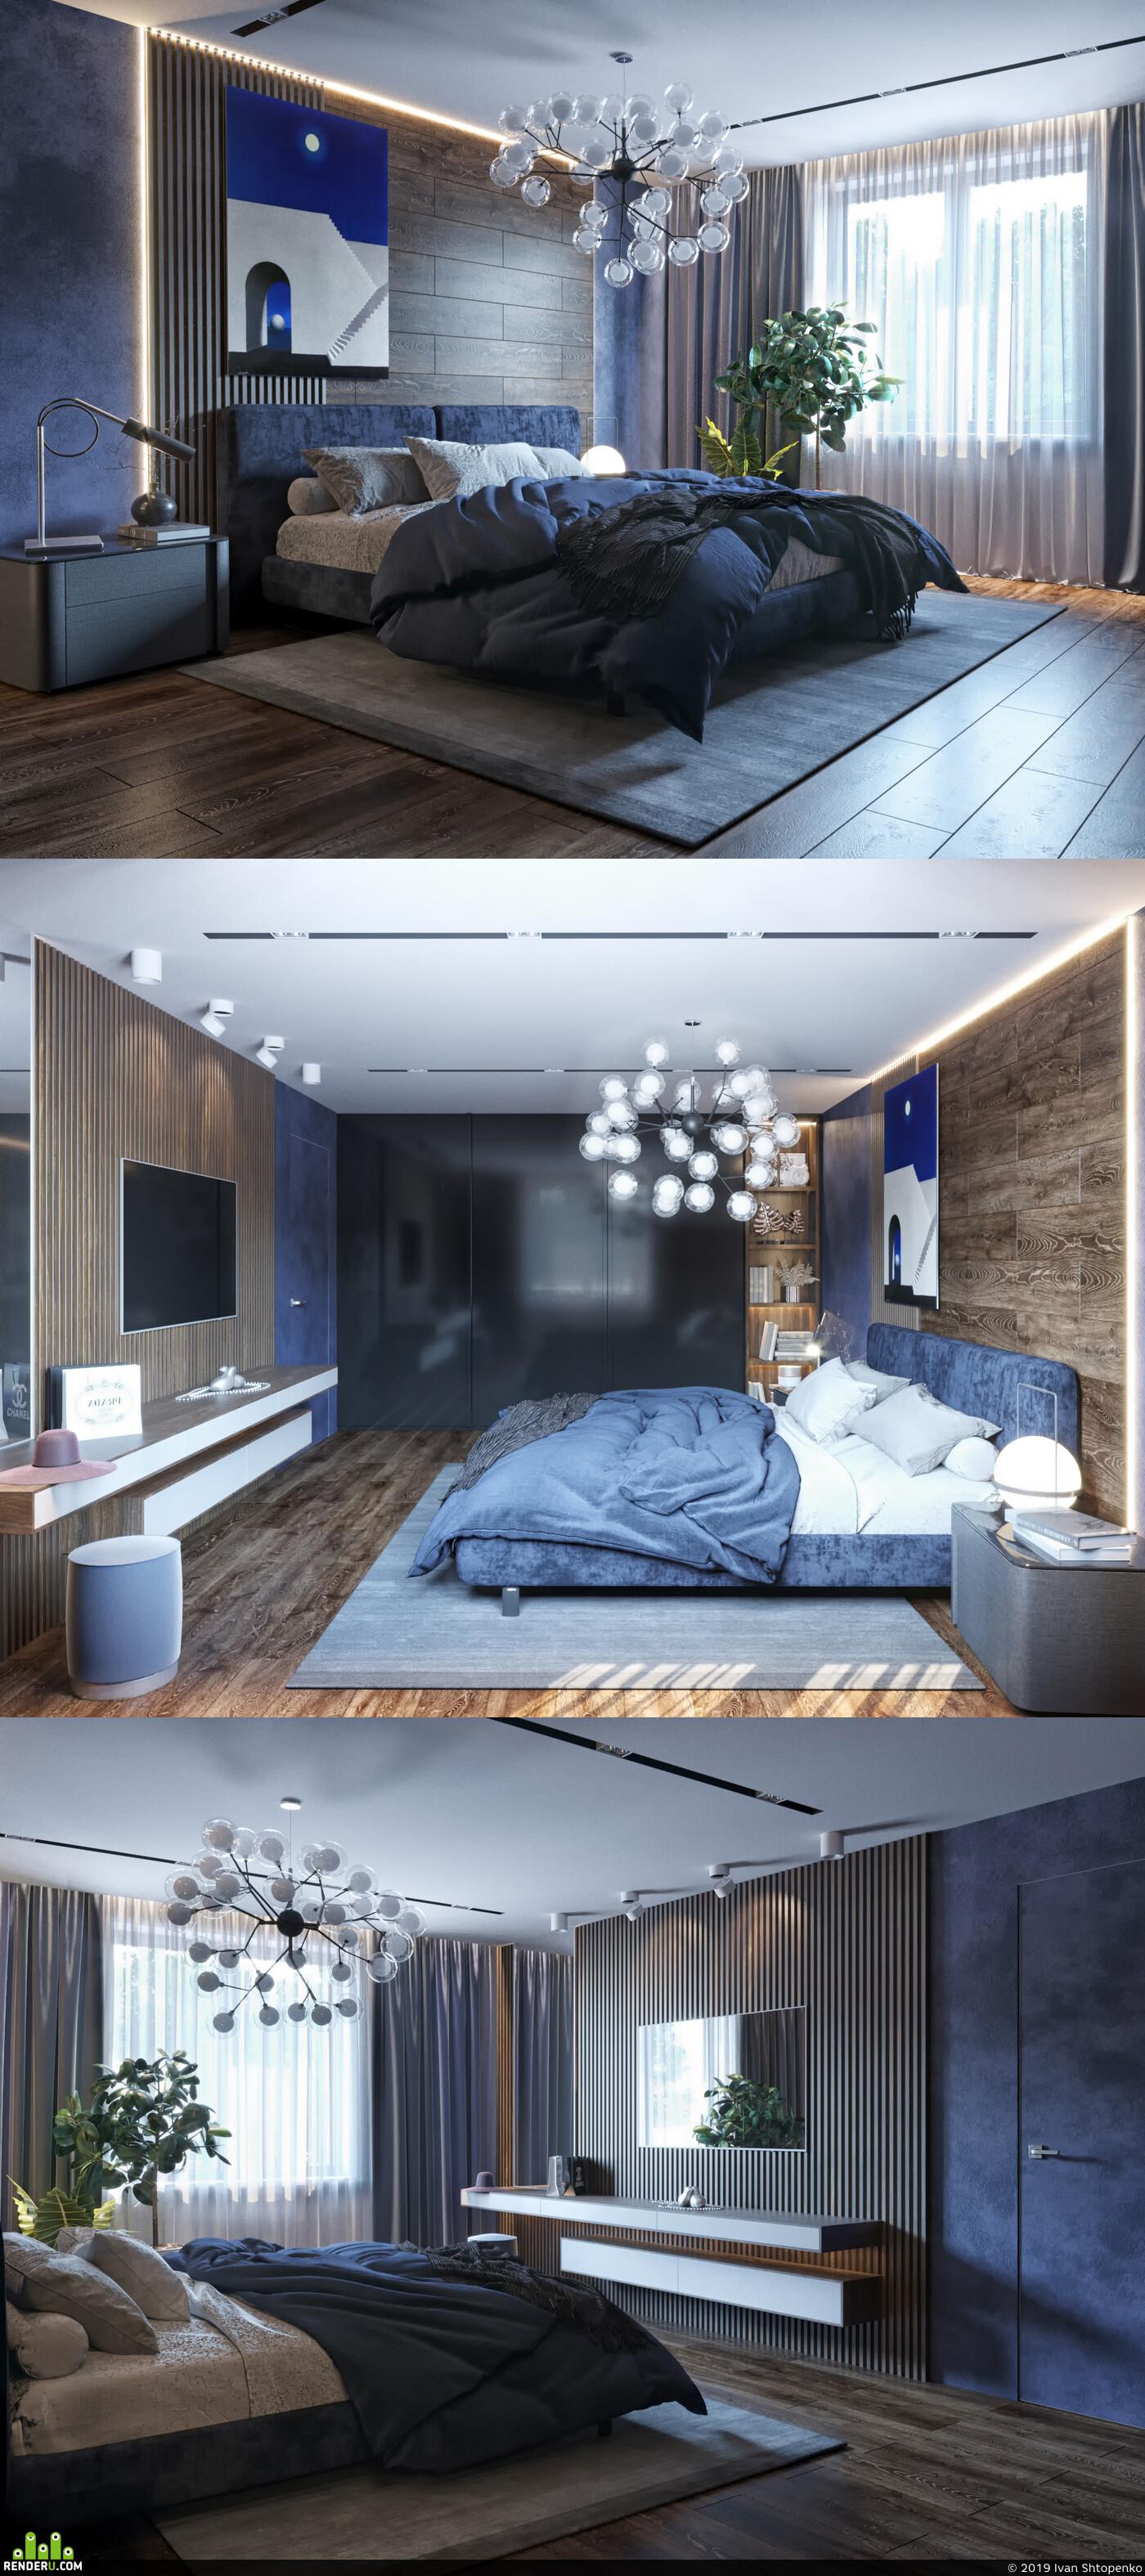 interior interior design design 3D 3D Studio Max 3D архитектура интерьер дизайн интерьера интерьер, visualization